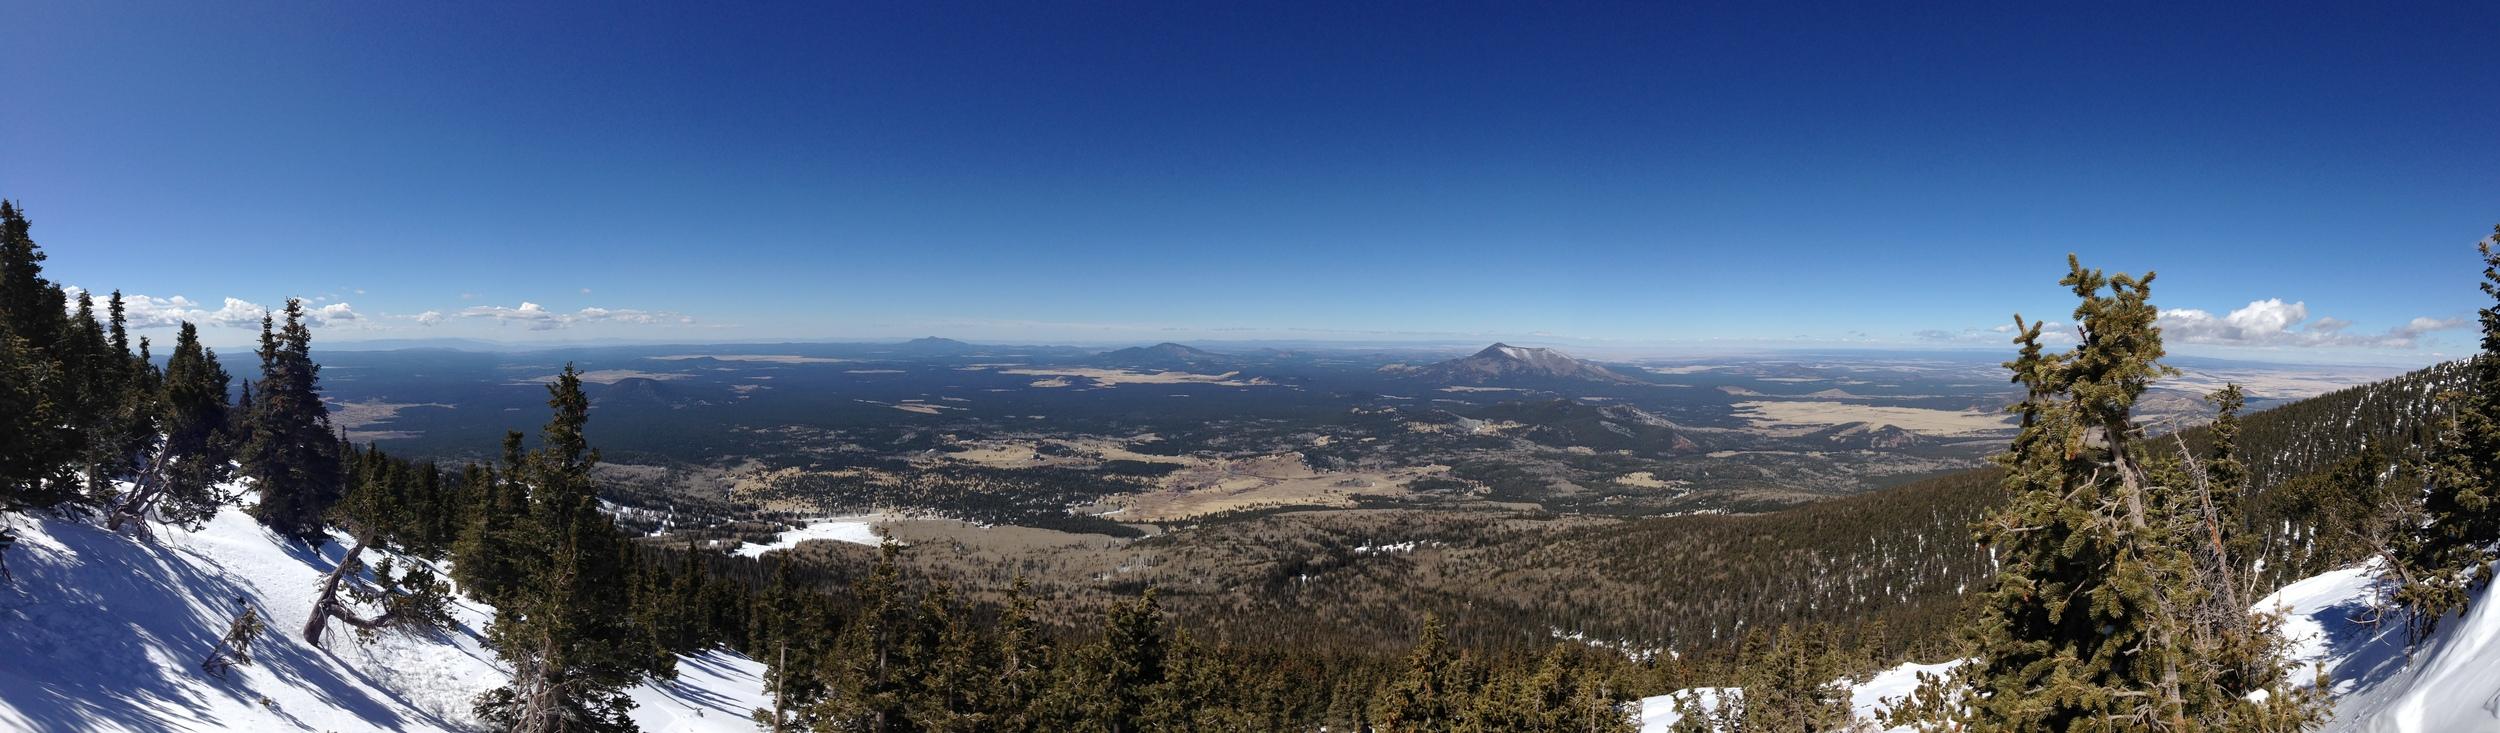 Humphreys Peak, March 2014